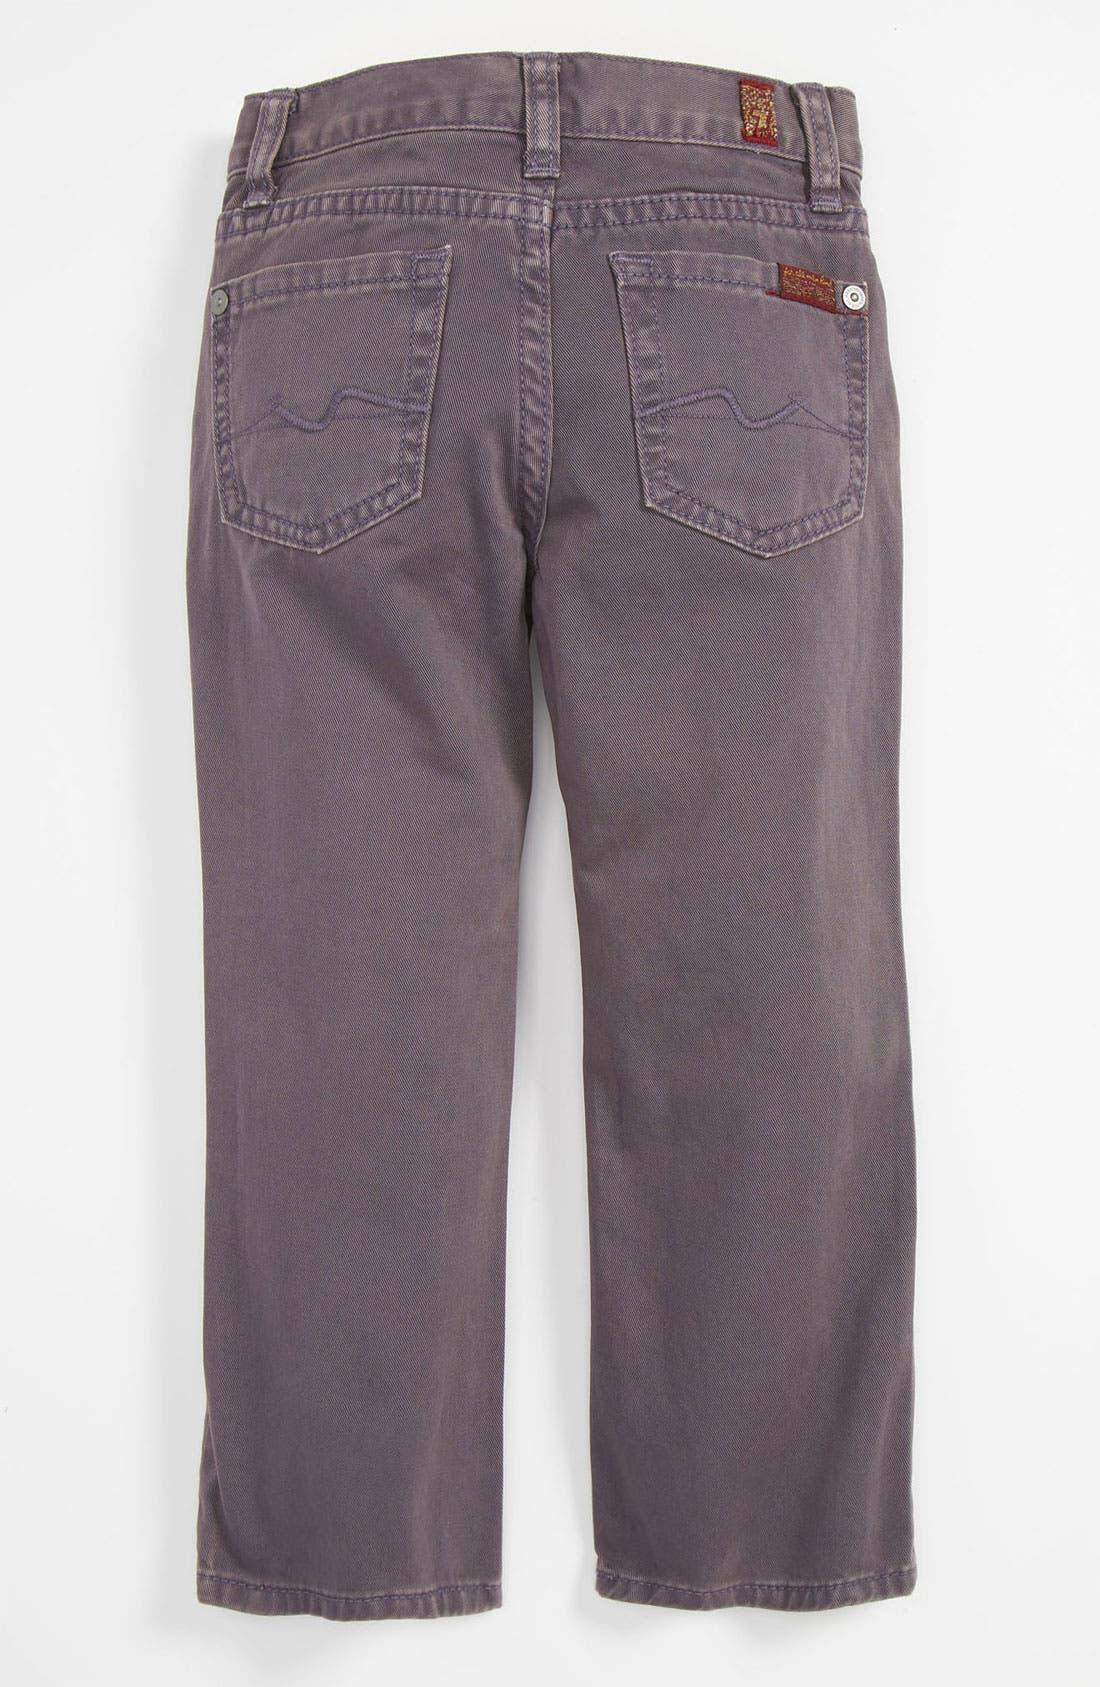 Alternate Image 1 Selected - 7 For All Mankind® 'Standard' Straight Leg Jeans (Toddler)